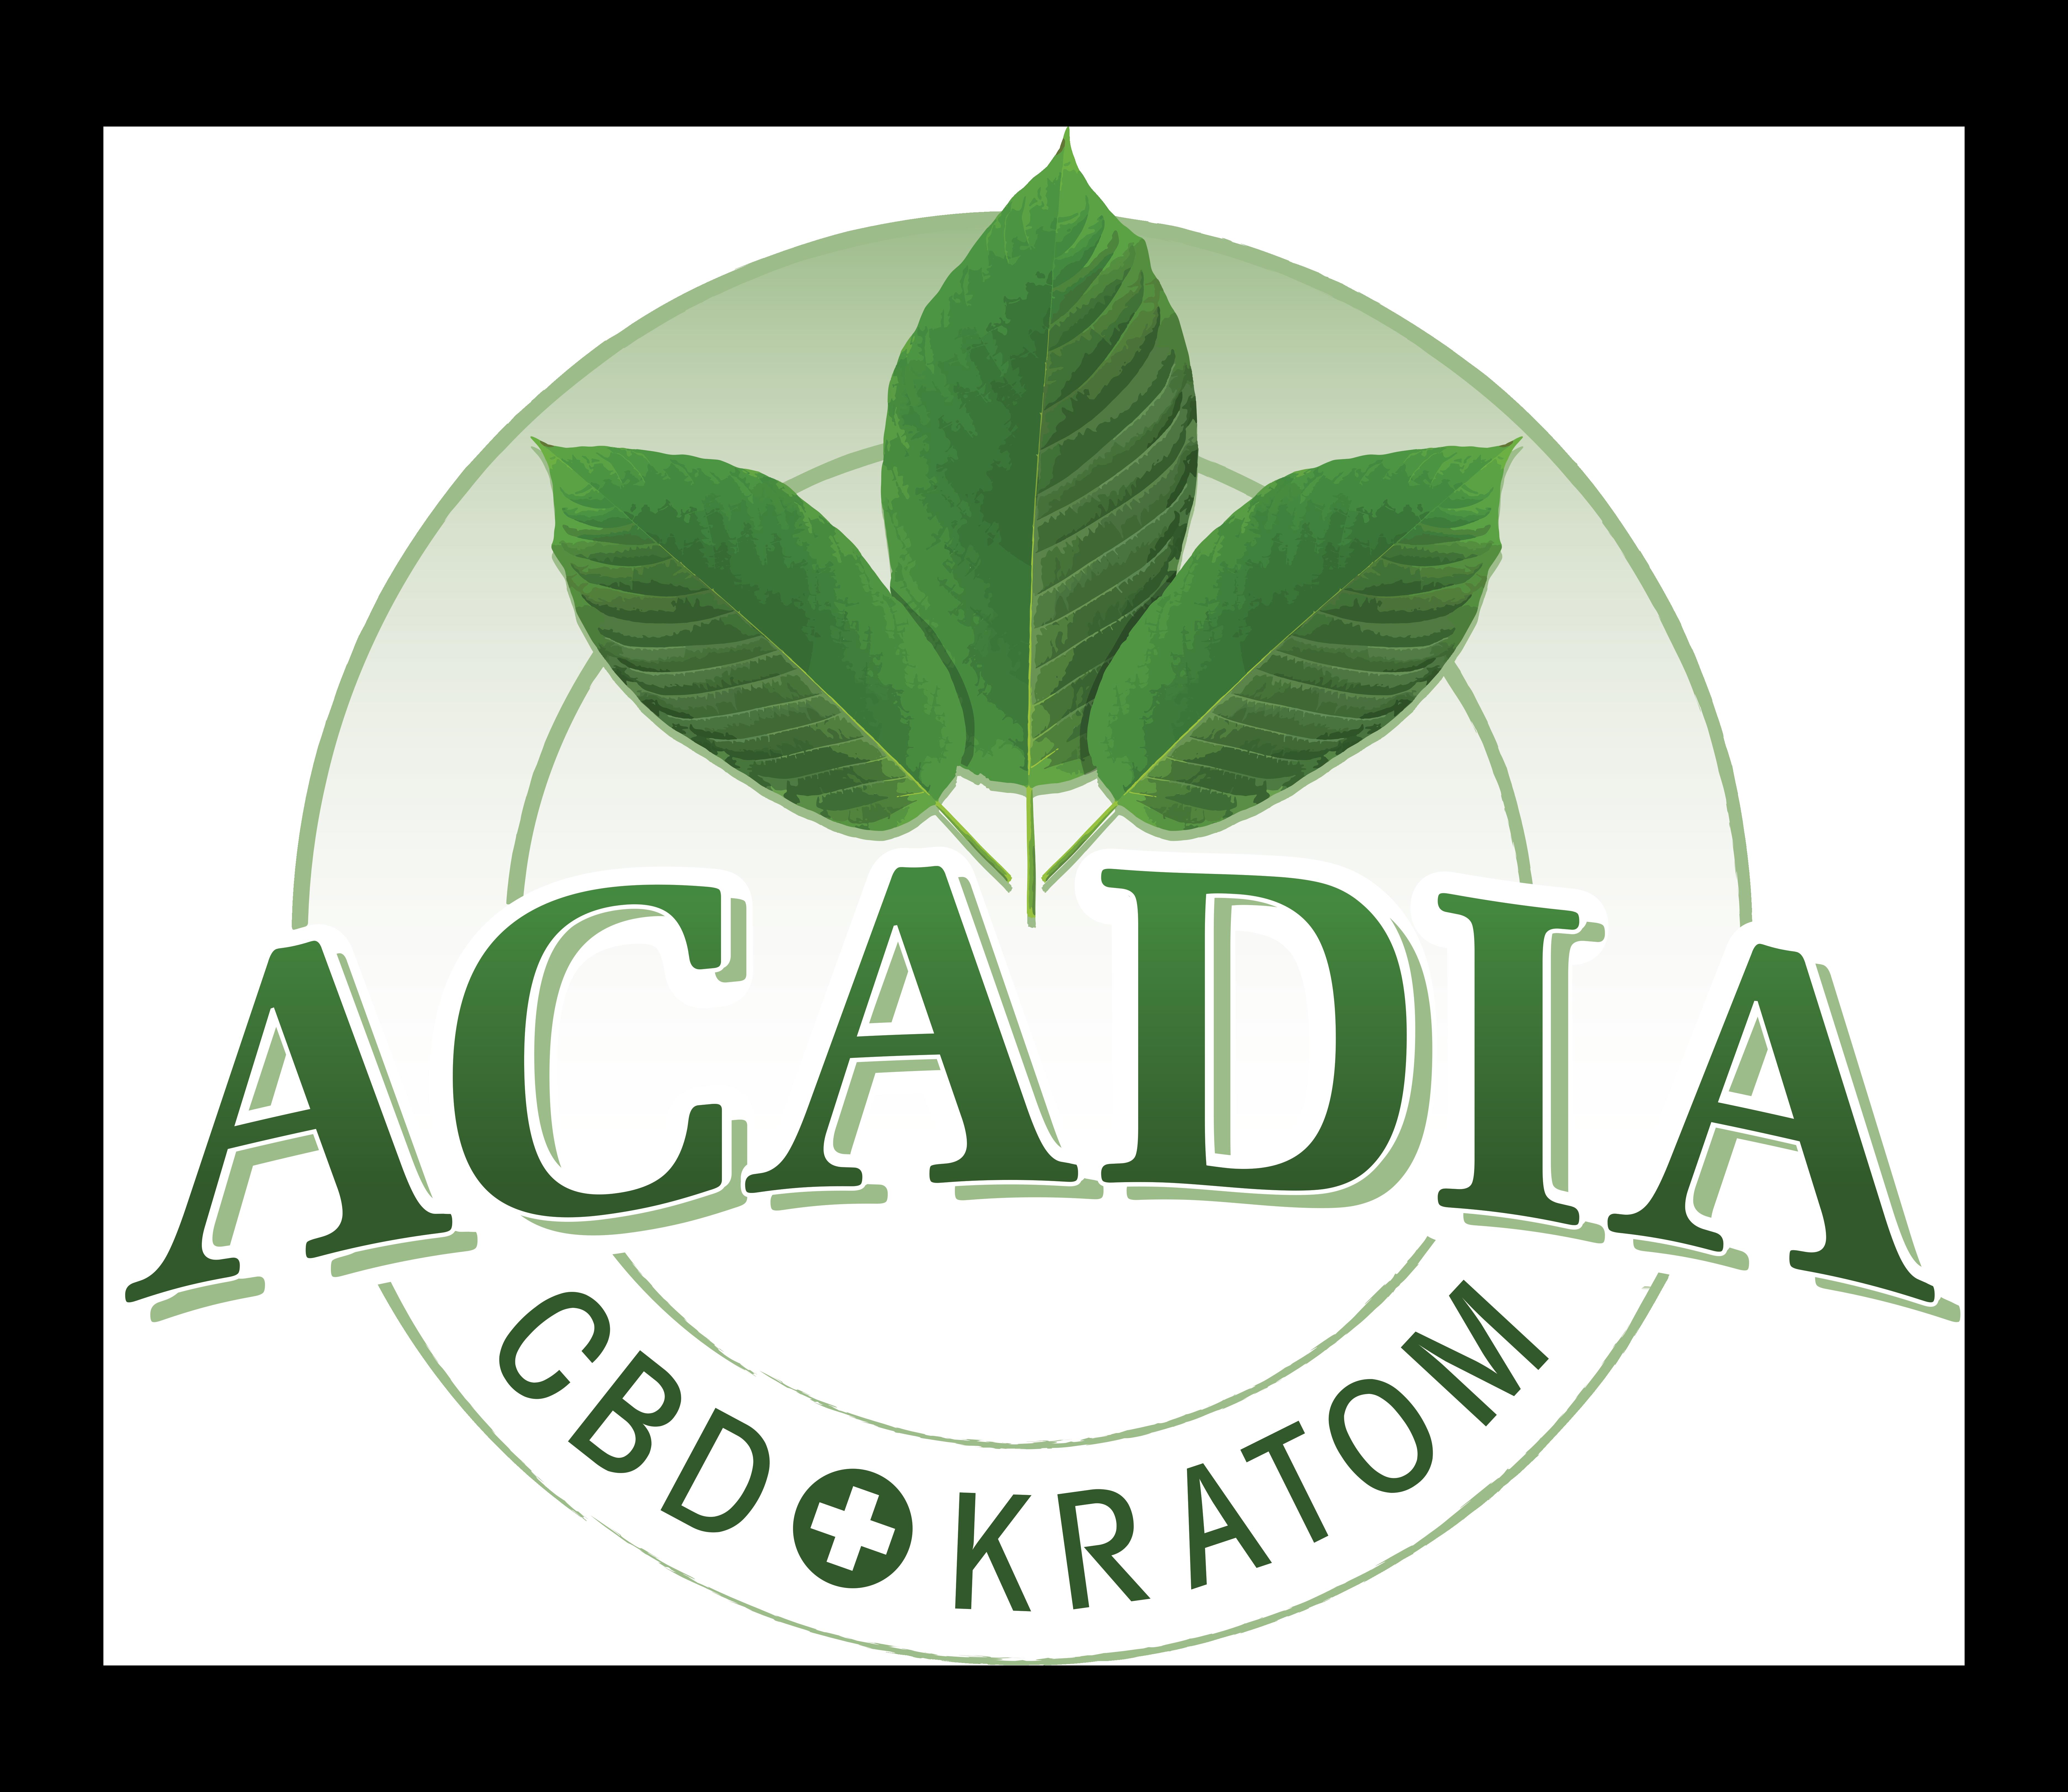 Acadia CBD & Kratom